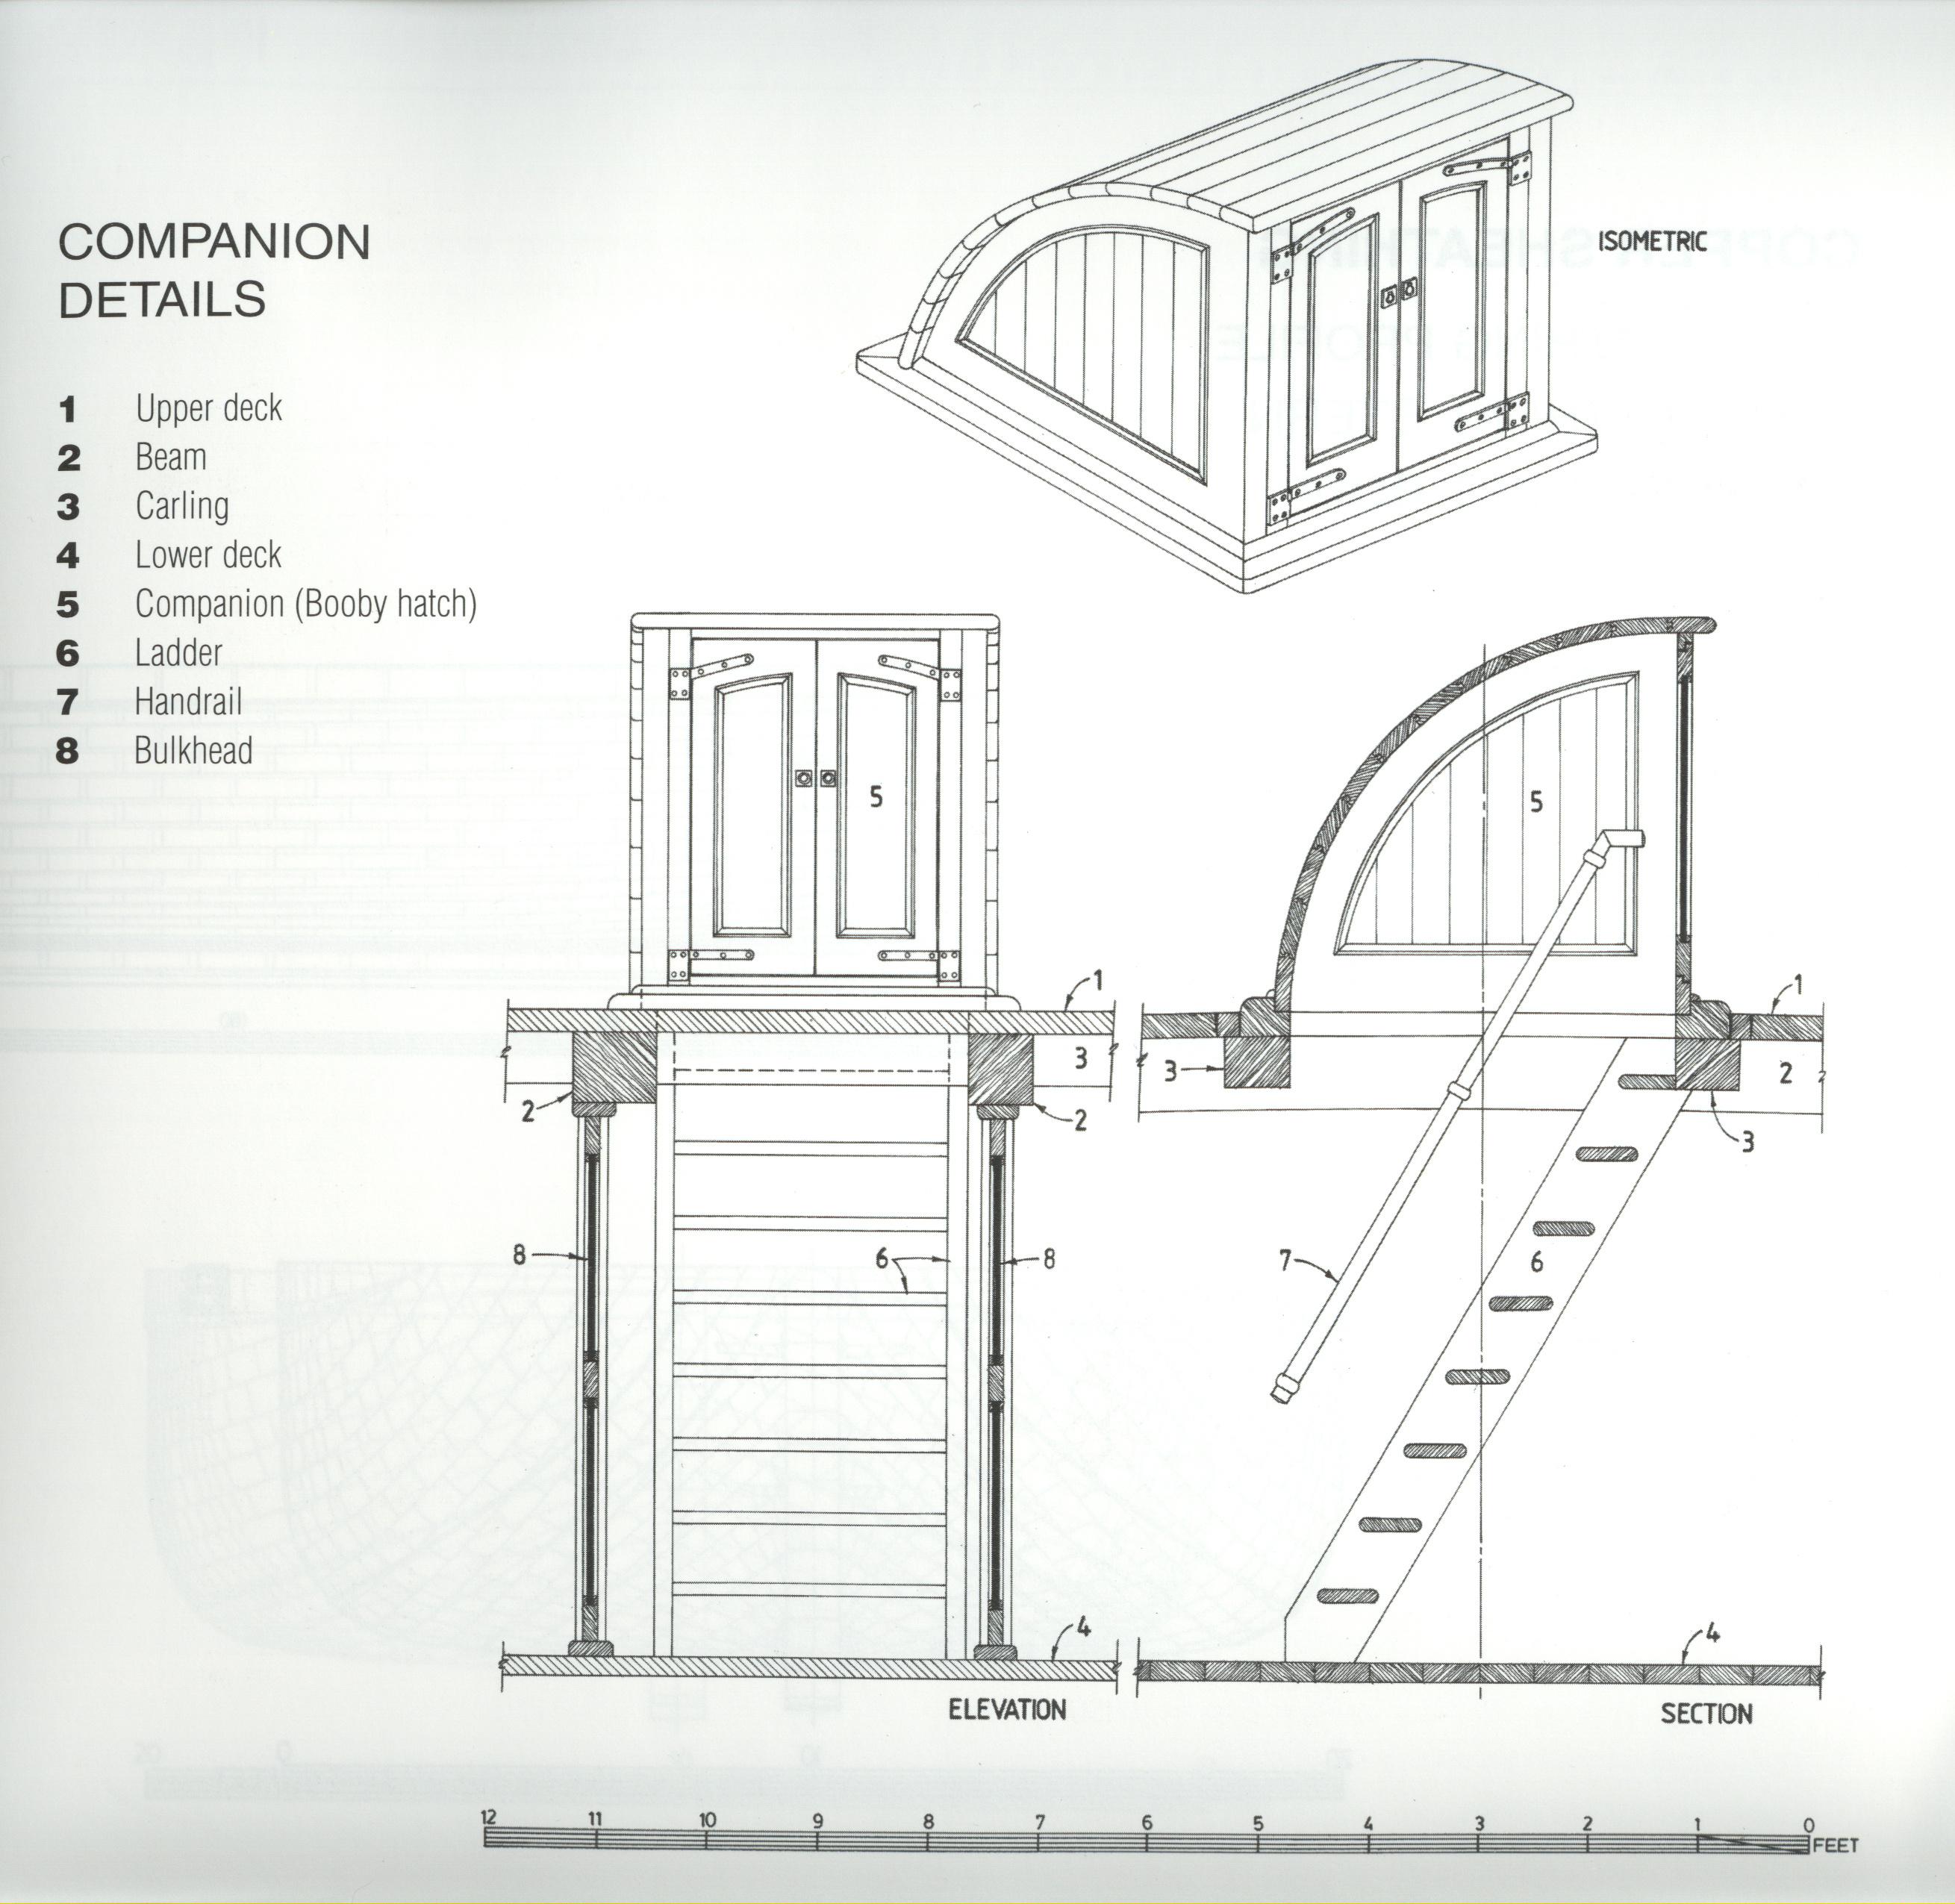 https://0901.nccdn.net/4_2/000/000/086/e7a/Plan---Beaver-Companion-Details-2619x2551.jpg